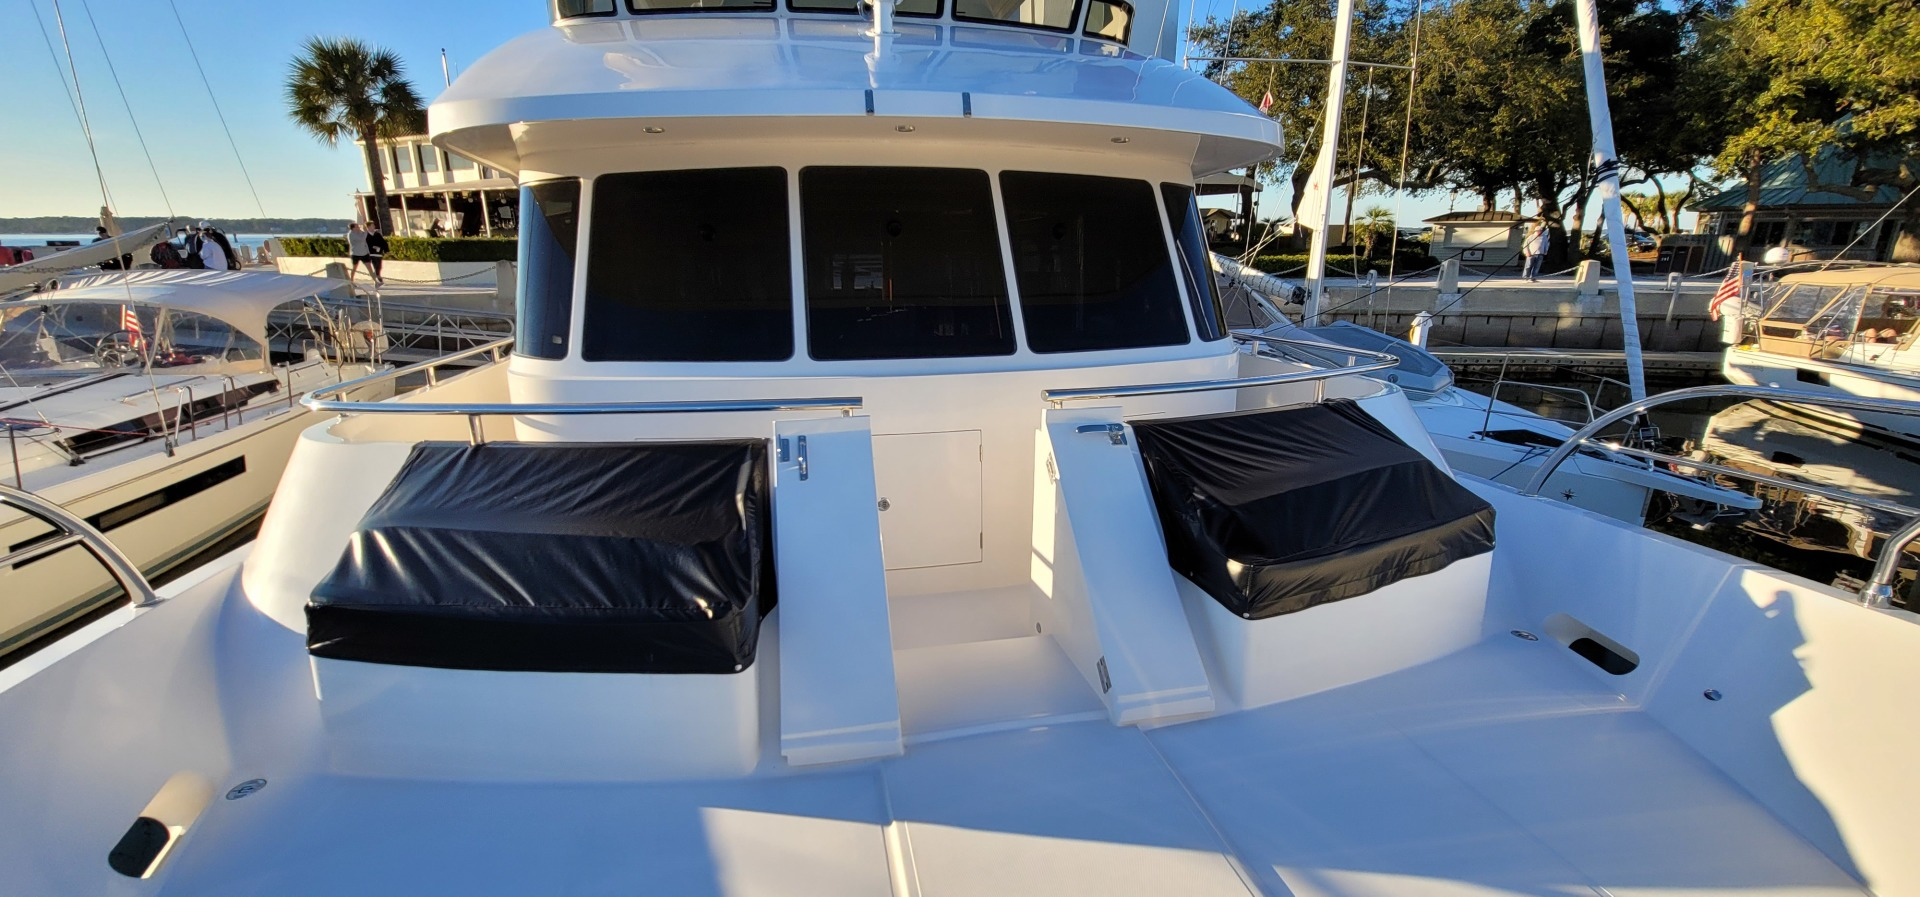 Hampton-640 Endurance 2014-Crystal Lady Saint Augustine-Florida-United States-1624614 | Thumbnail